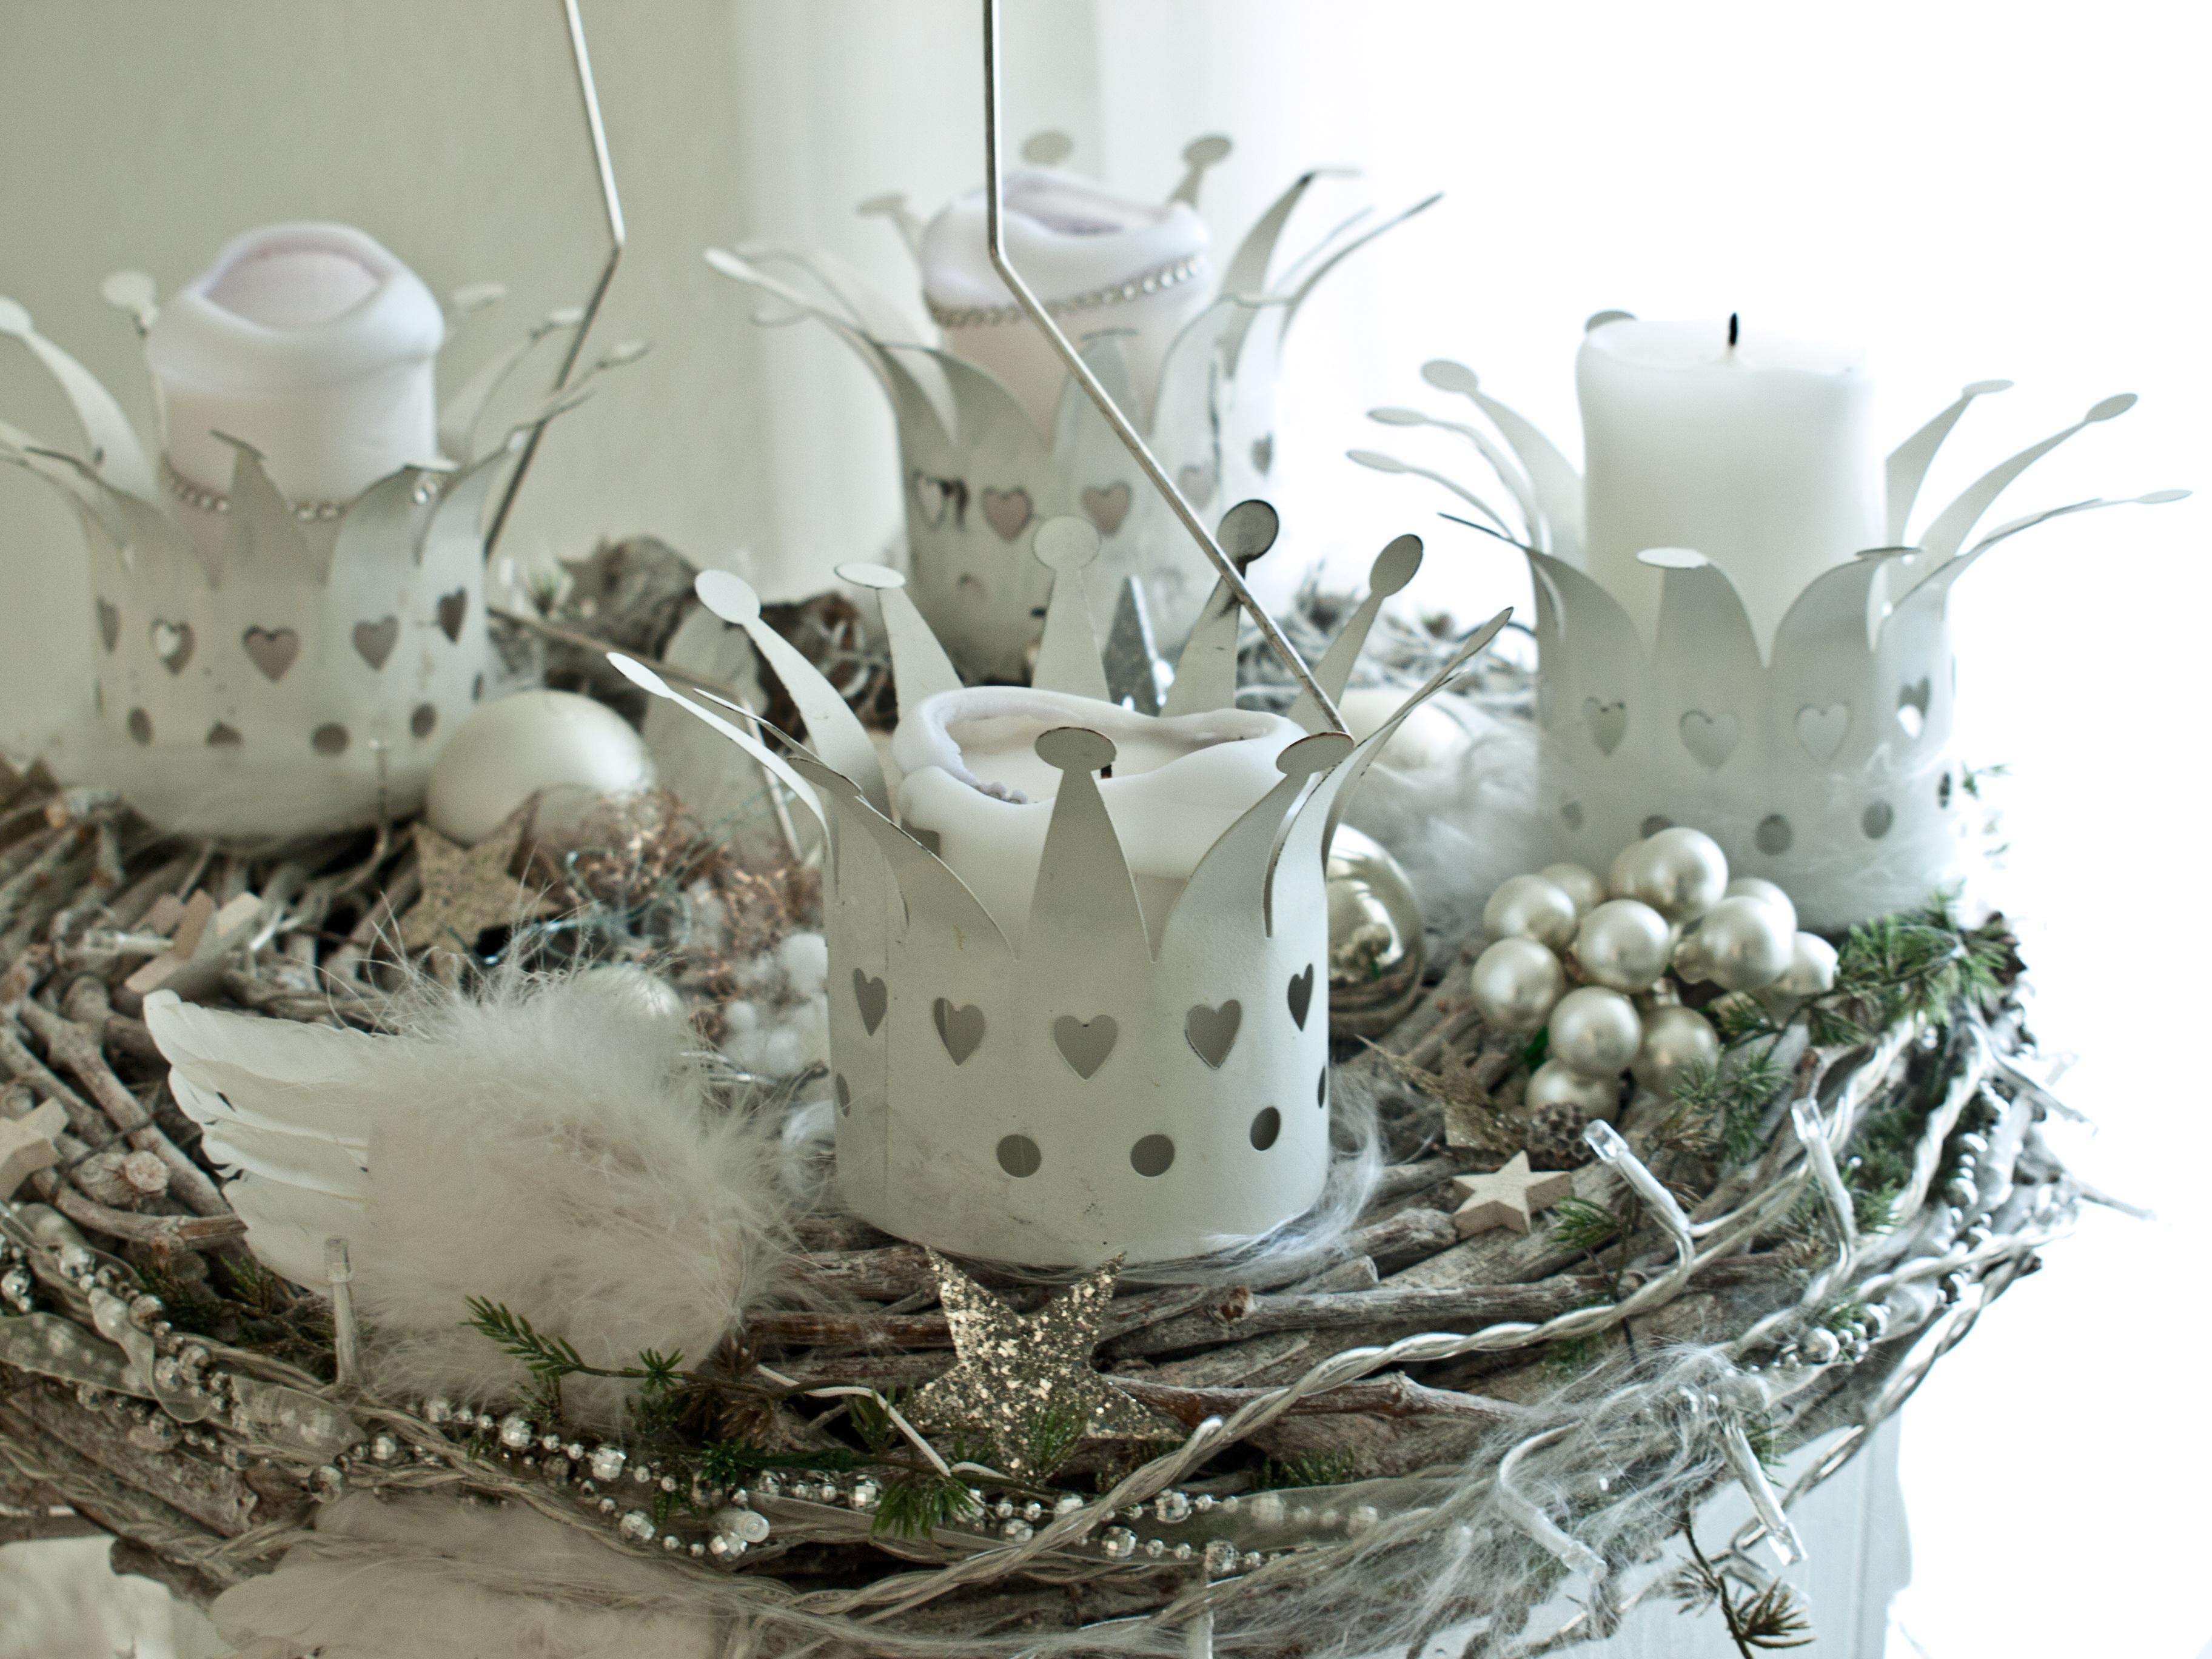 Free images white flower lighting christmas wreath deco free images white flower lighting christmas wreath deco christmas decoration christmas time festival holidays 4 noel xmas festive decorations mightylinksfo